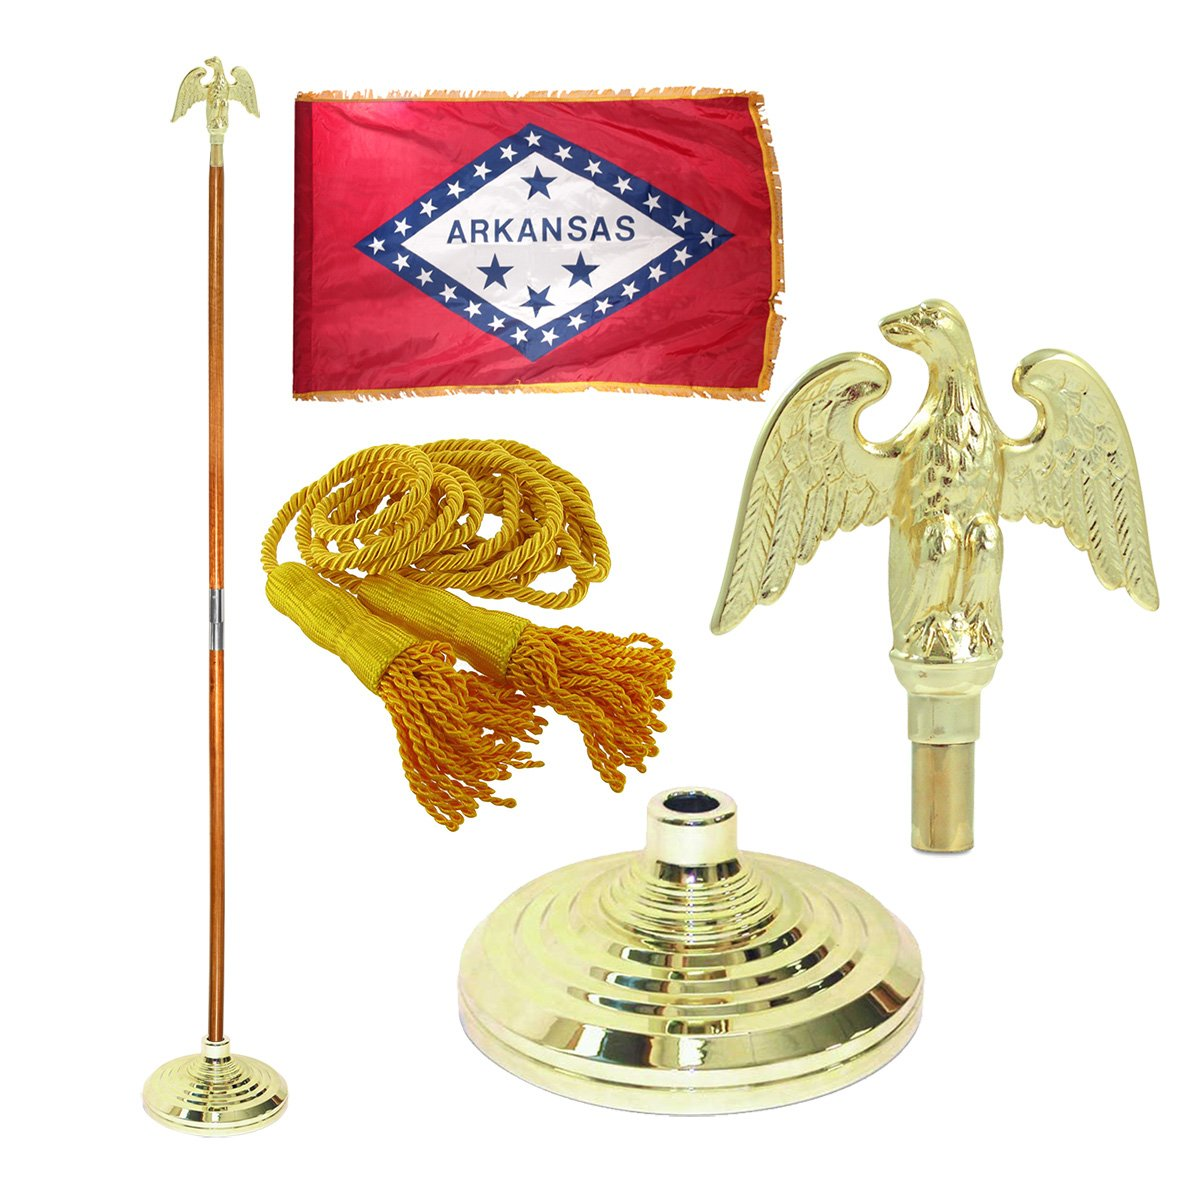 Arkansas 3ft x 5ft Flag, Flagpole, Base, and Tassel (Metal Eagle, 8 Ft Oak Pole)